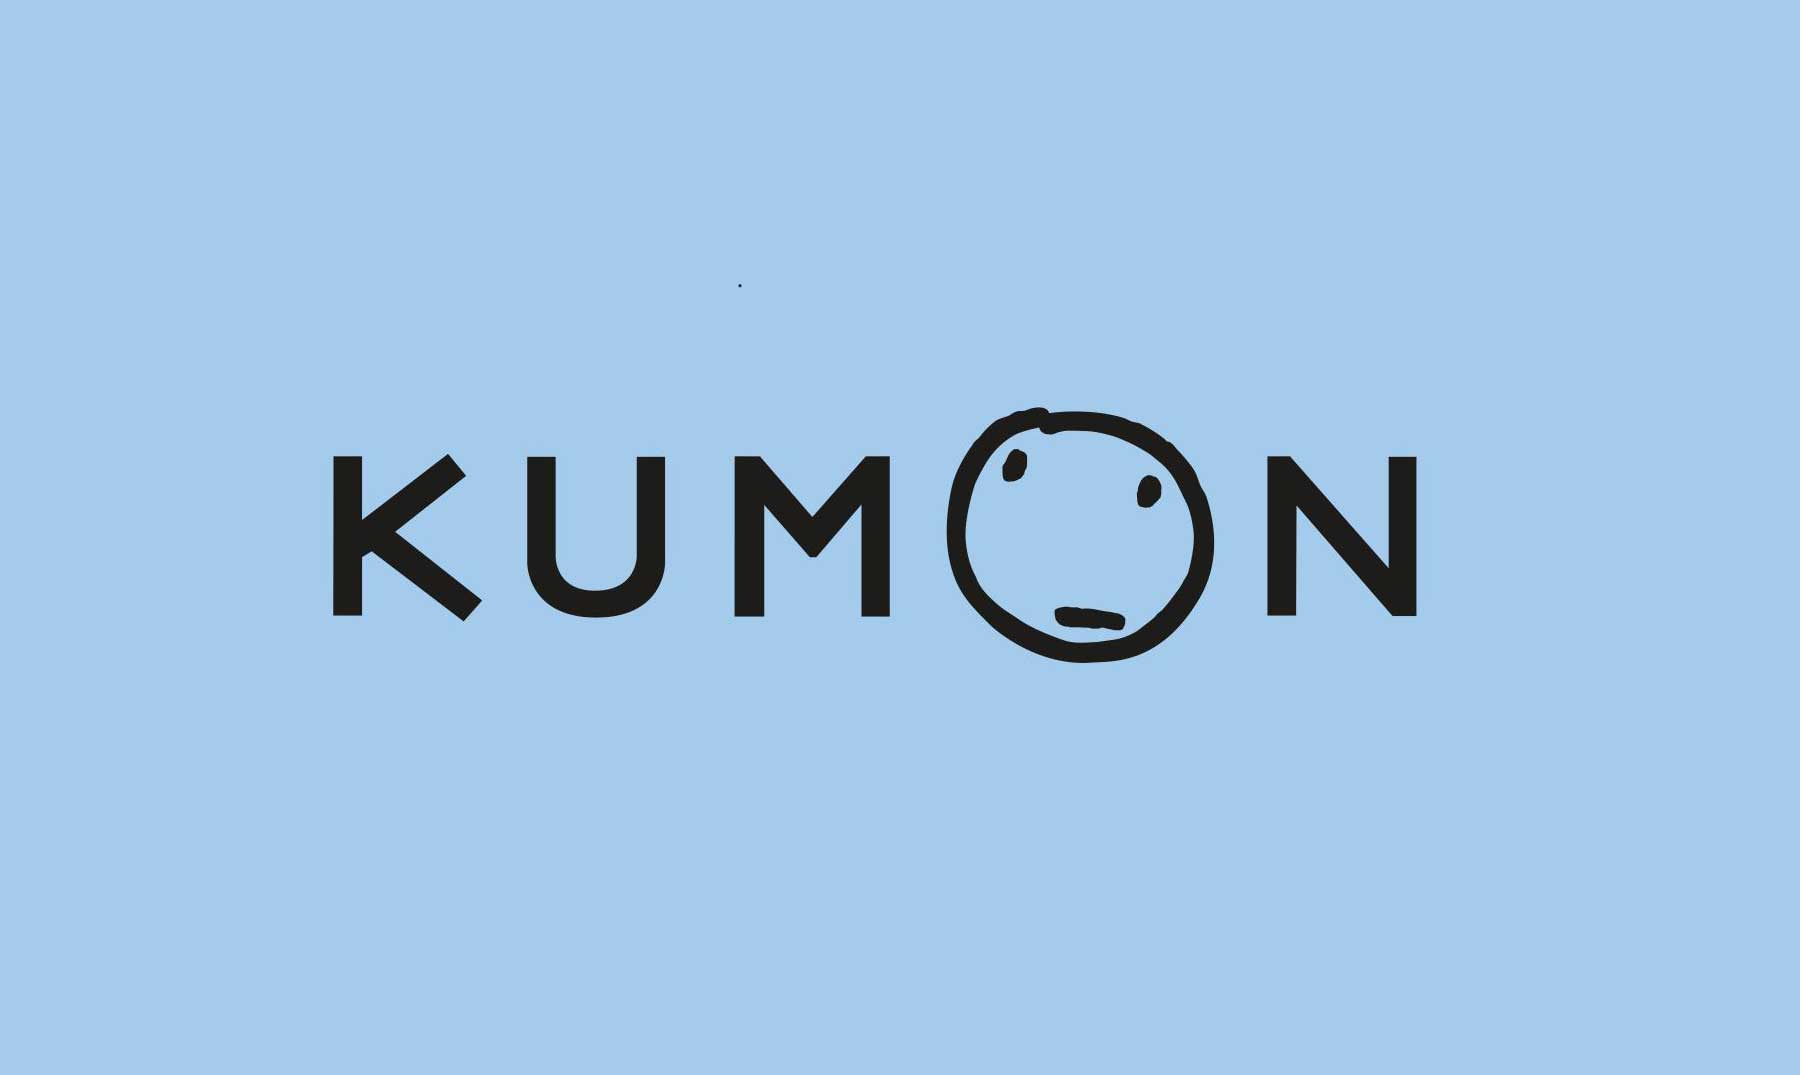 Franquicia Kumon - Pasos para invertir